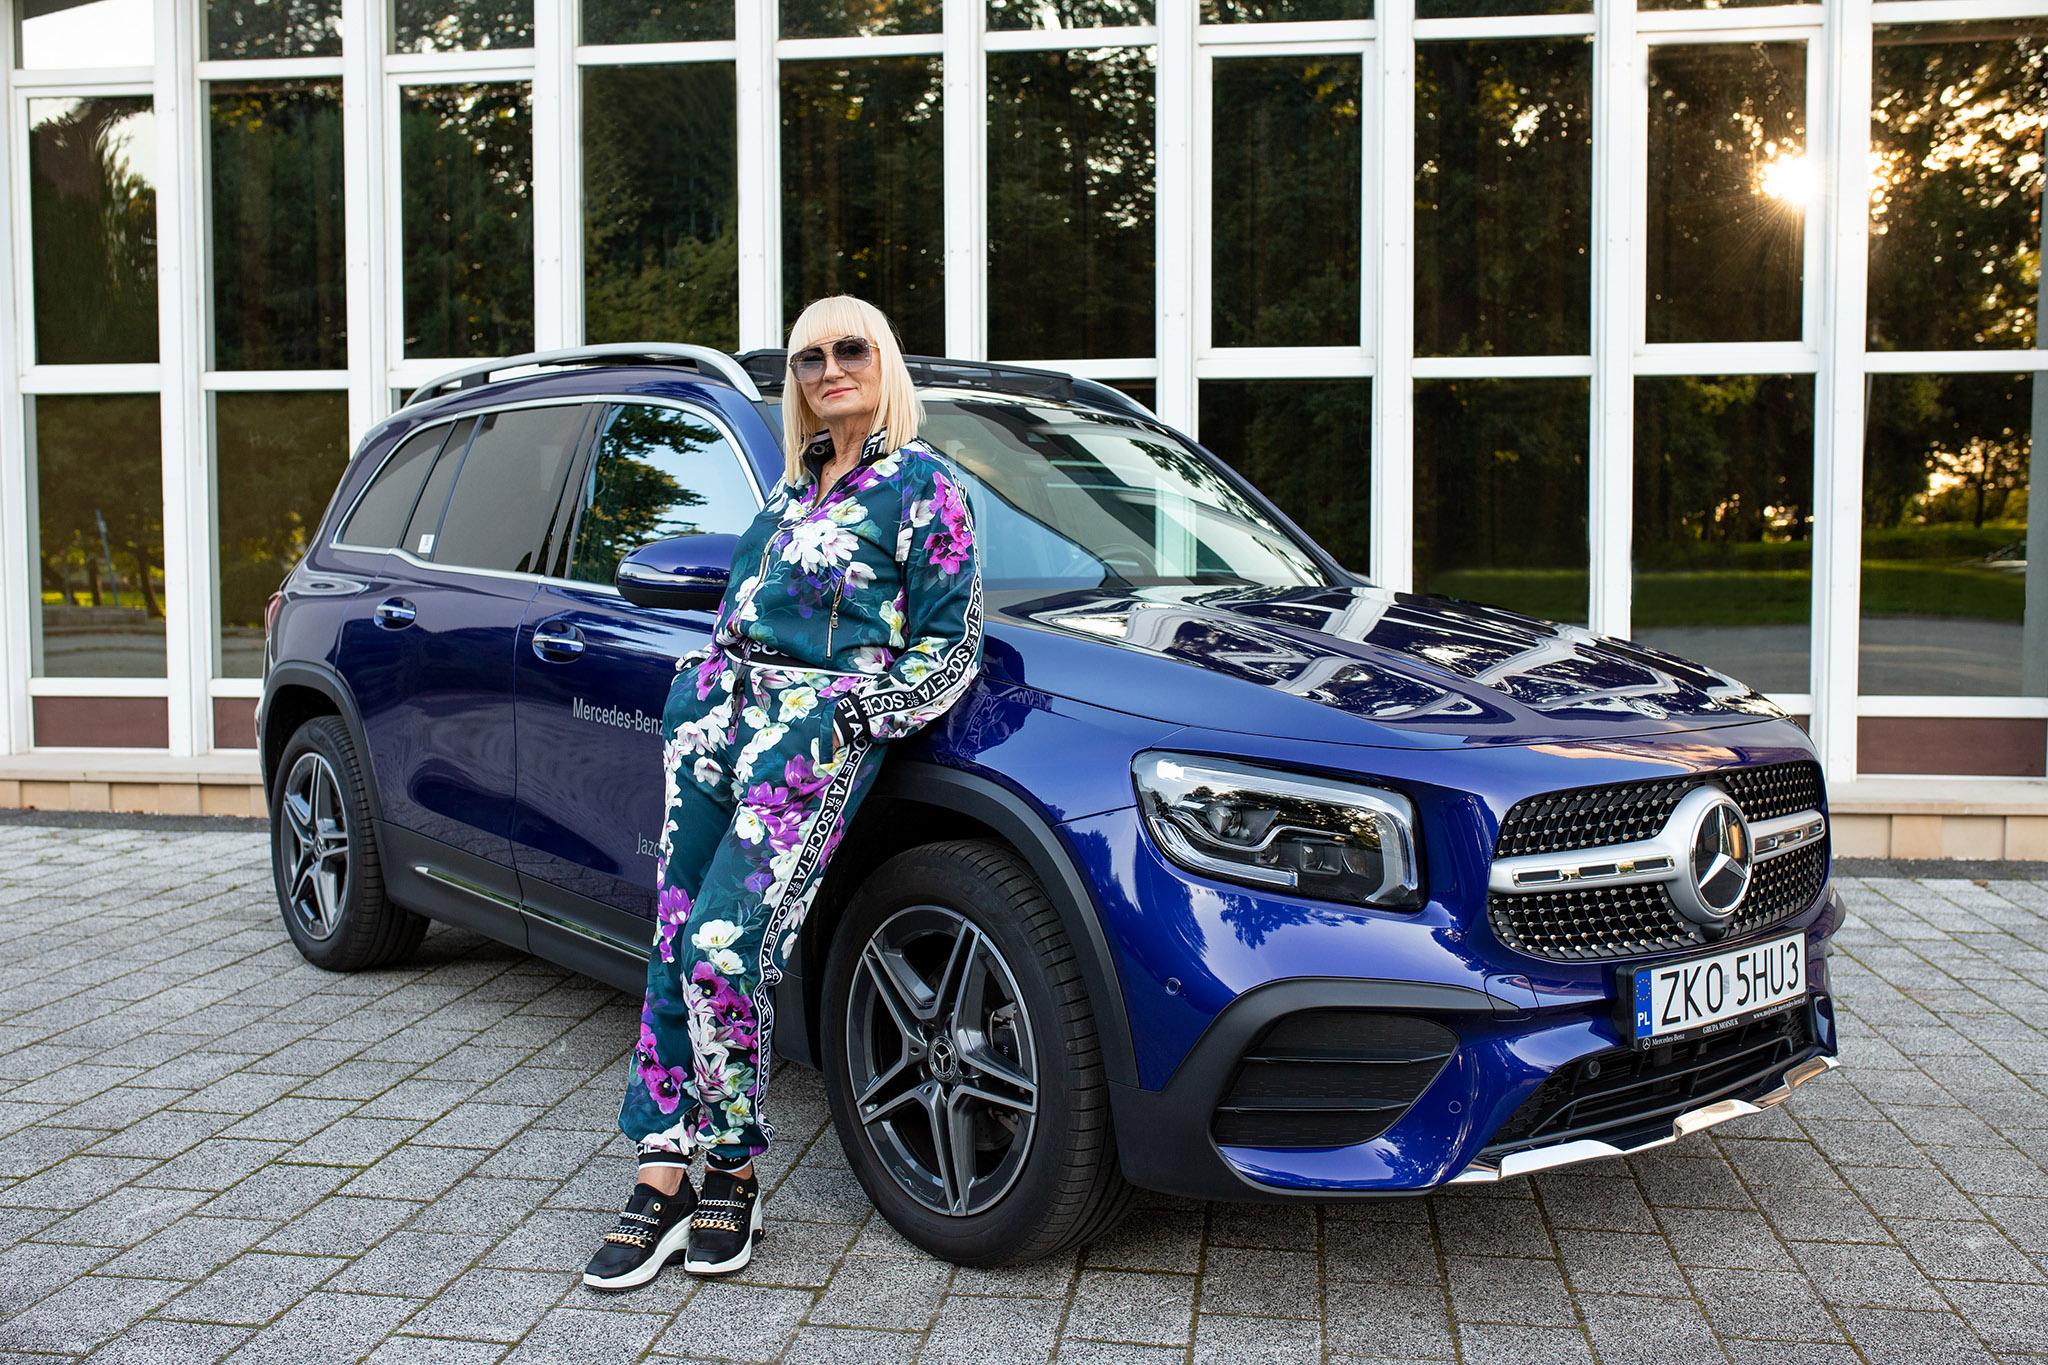 Pani Jolanta Podgórska w dresie marki Societa (cena 550 zł)